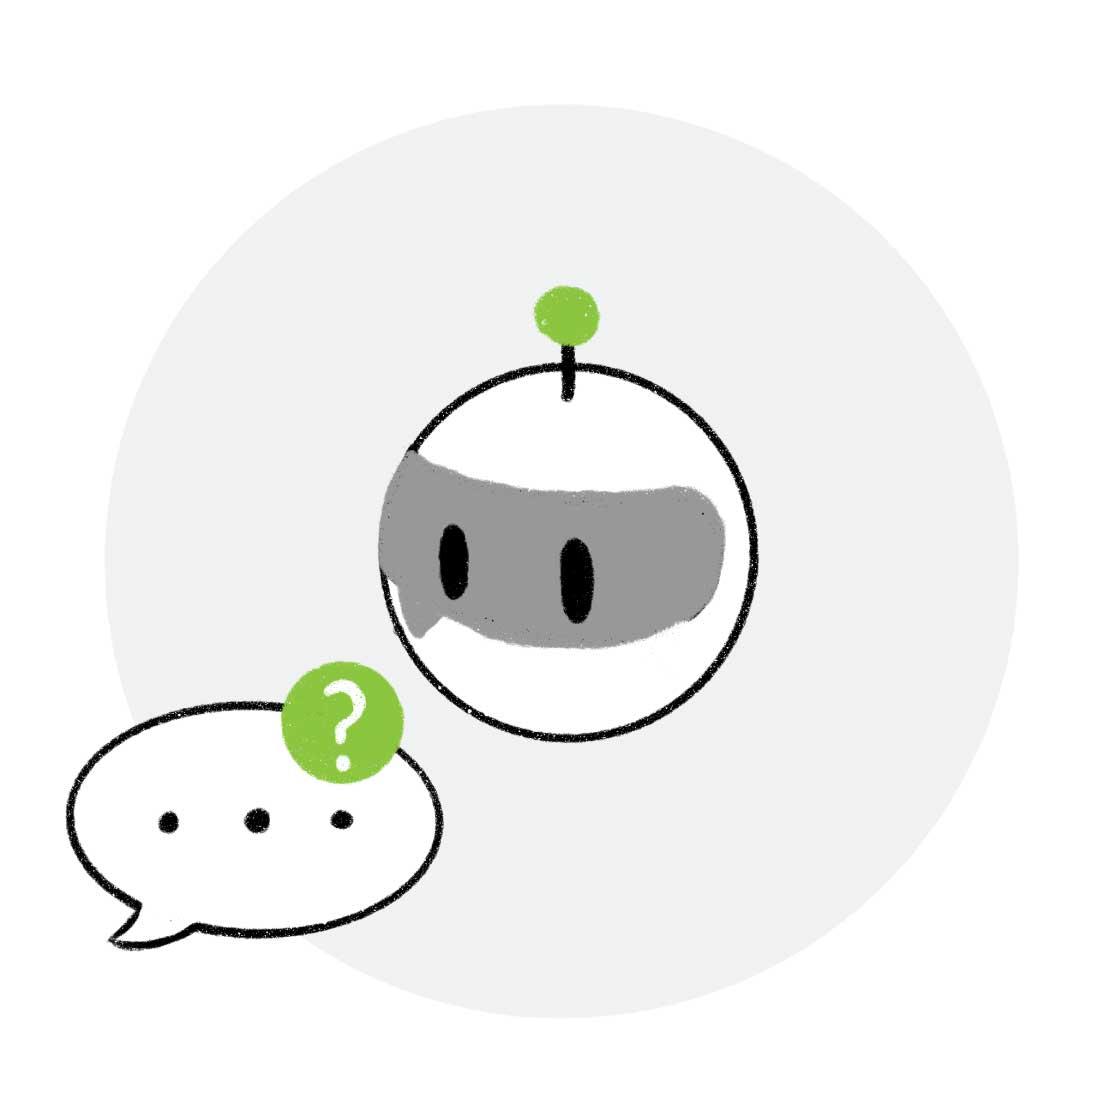 Chat Bot E Community Management